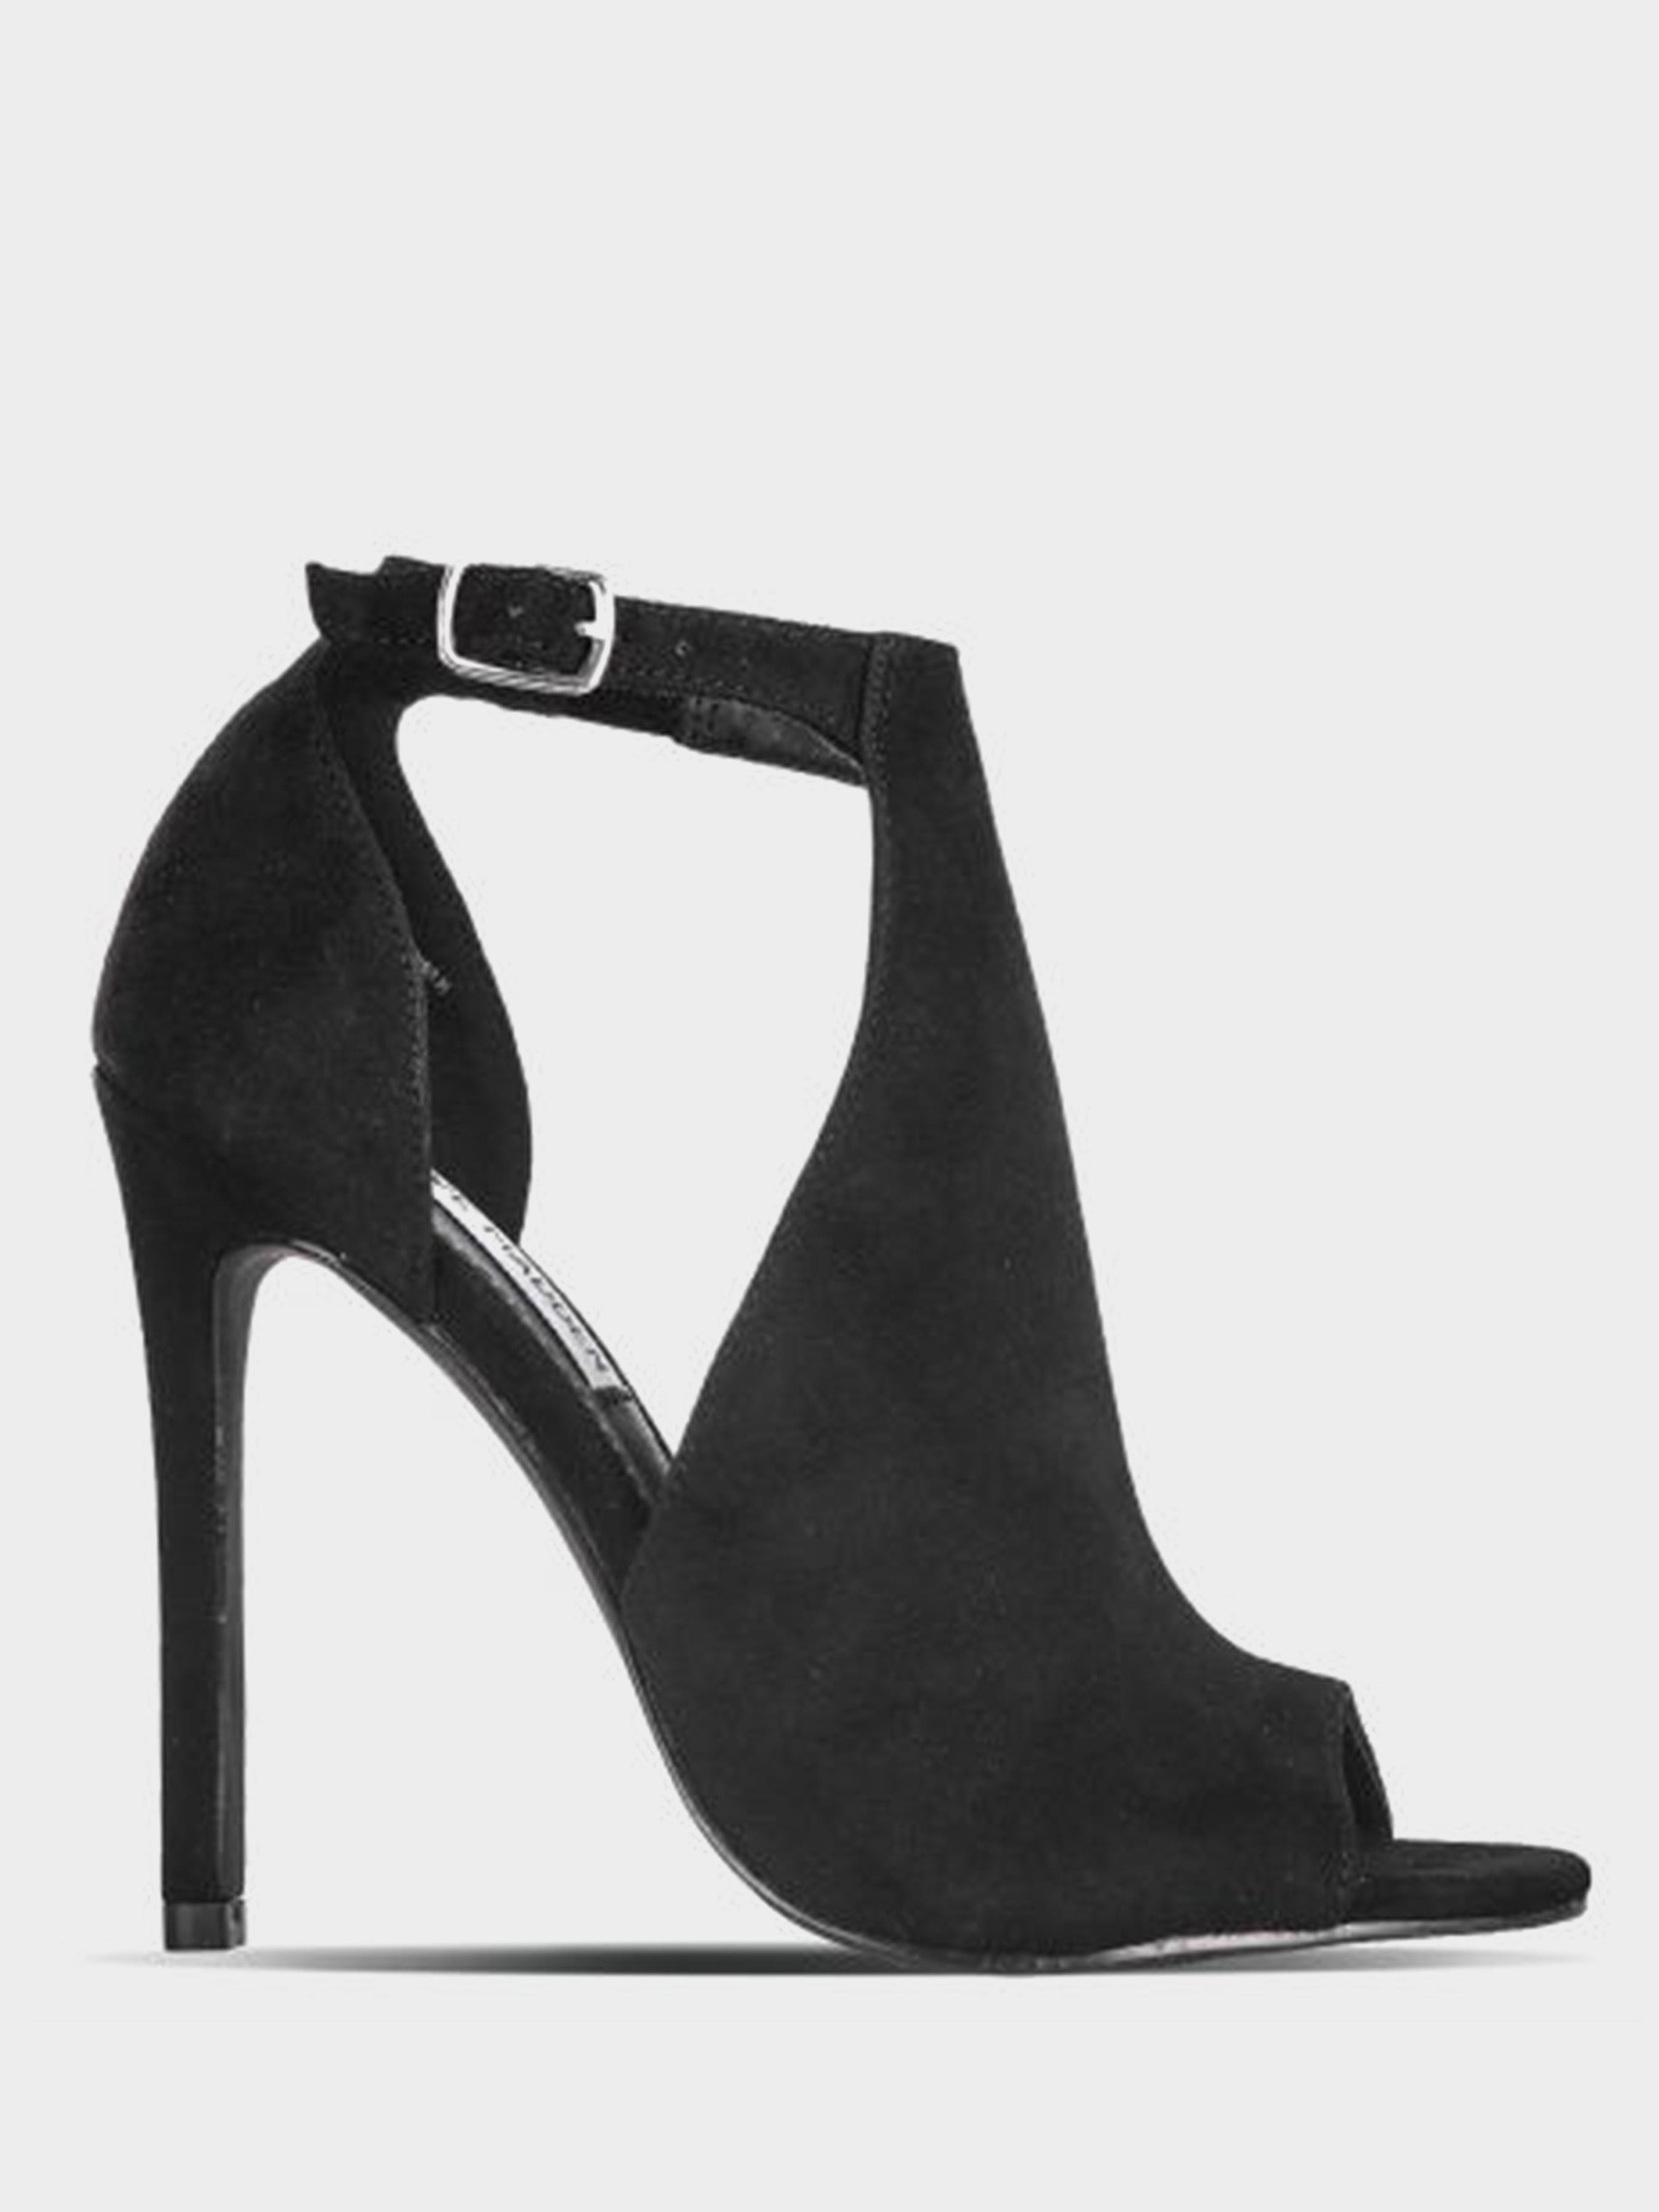 Босоножки женские Steve Madden SLOANE 9T69 размеры обуви, 2017